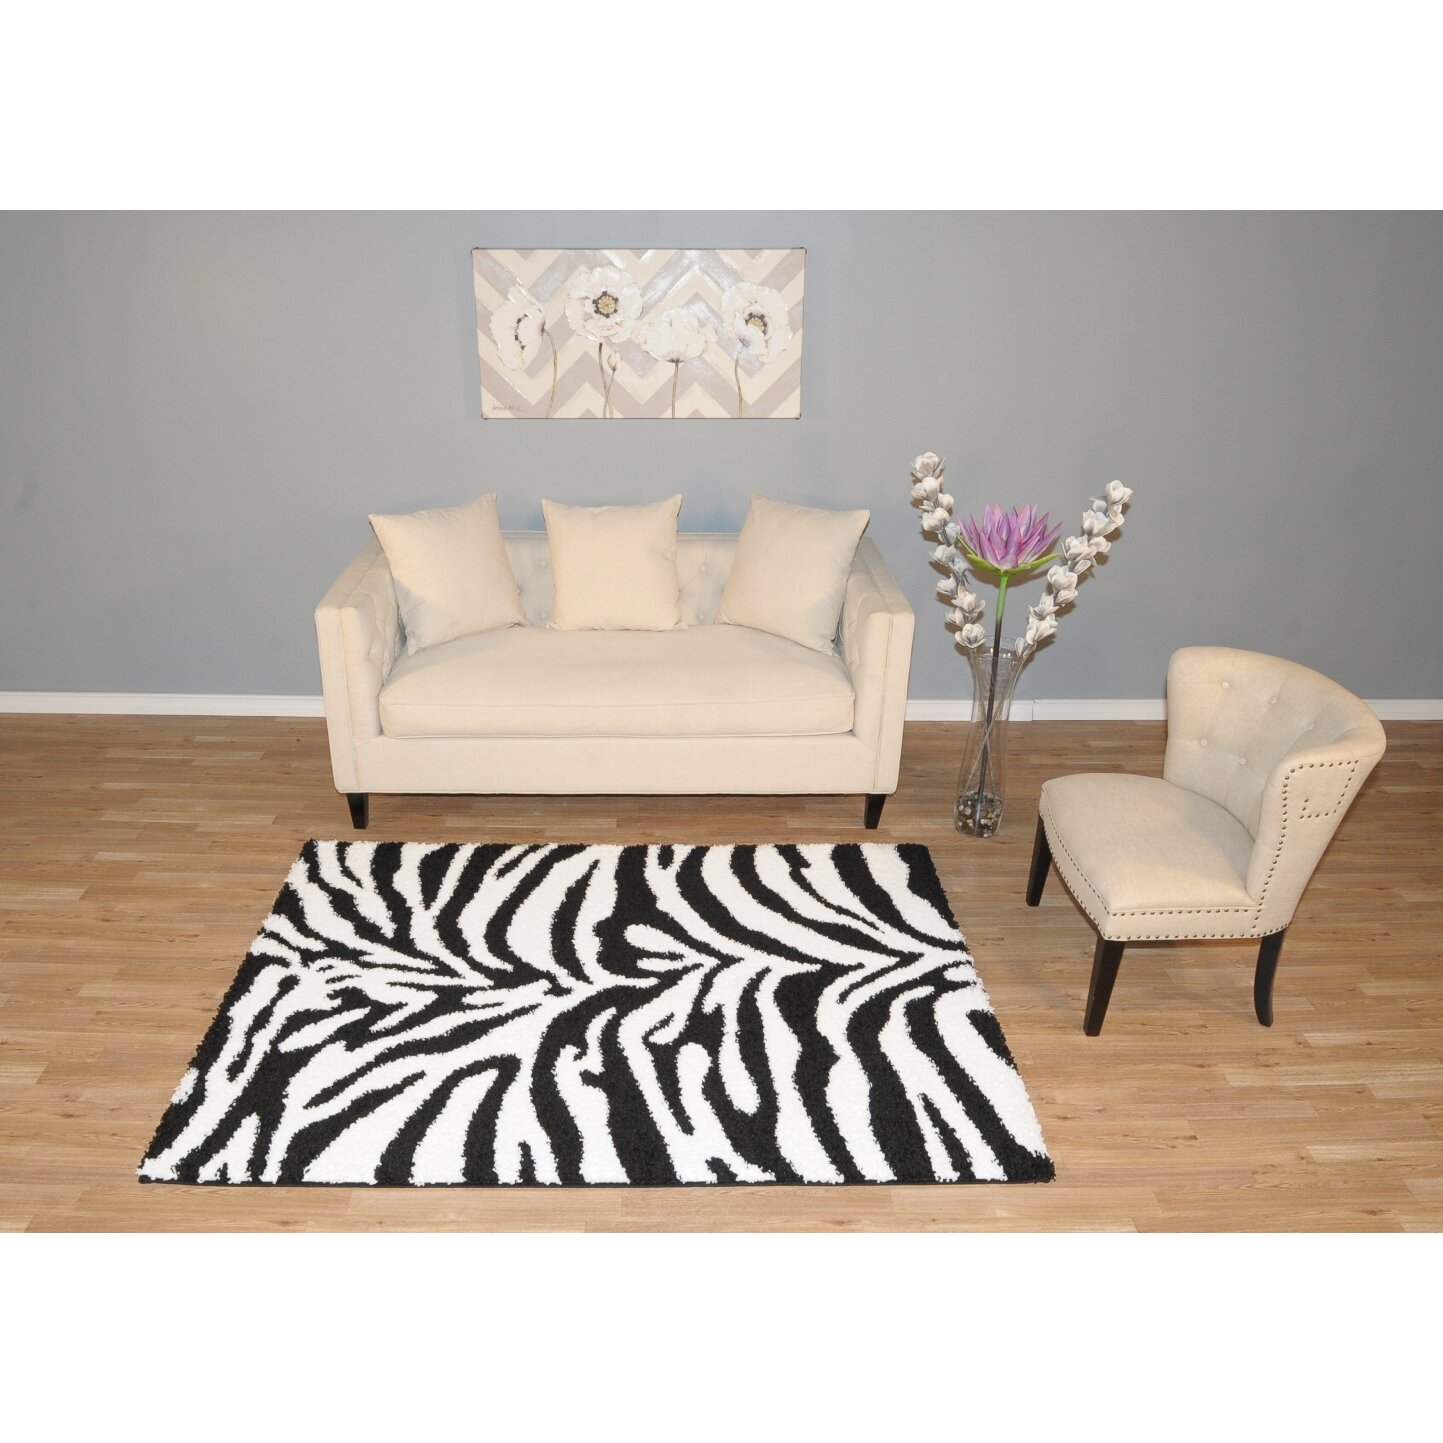 Rugnur Bella Zebra Print Black Amp White Shag Area Rug